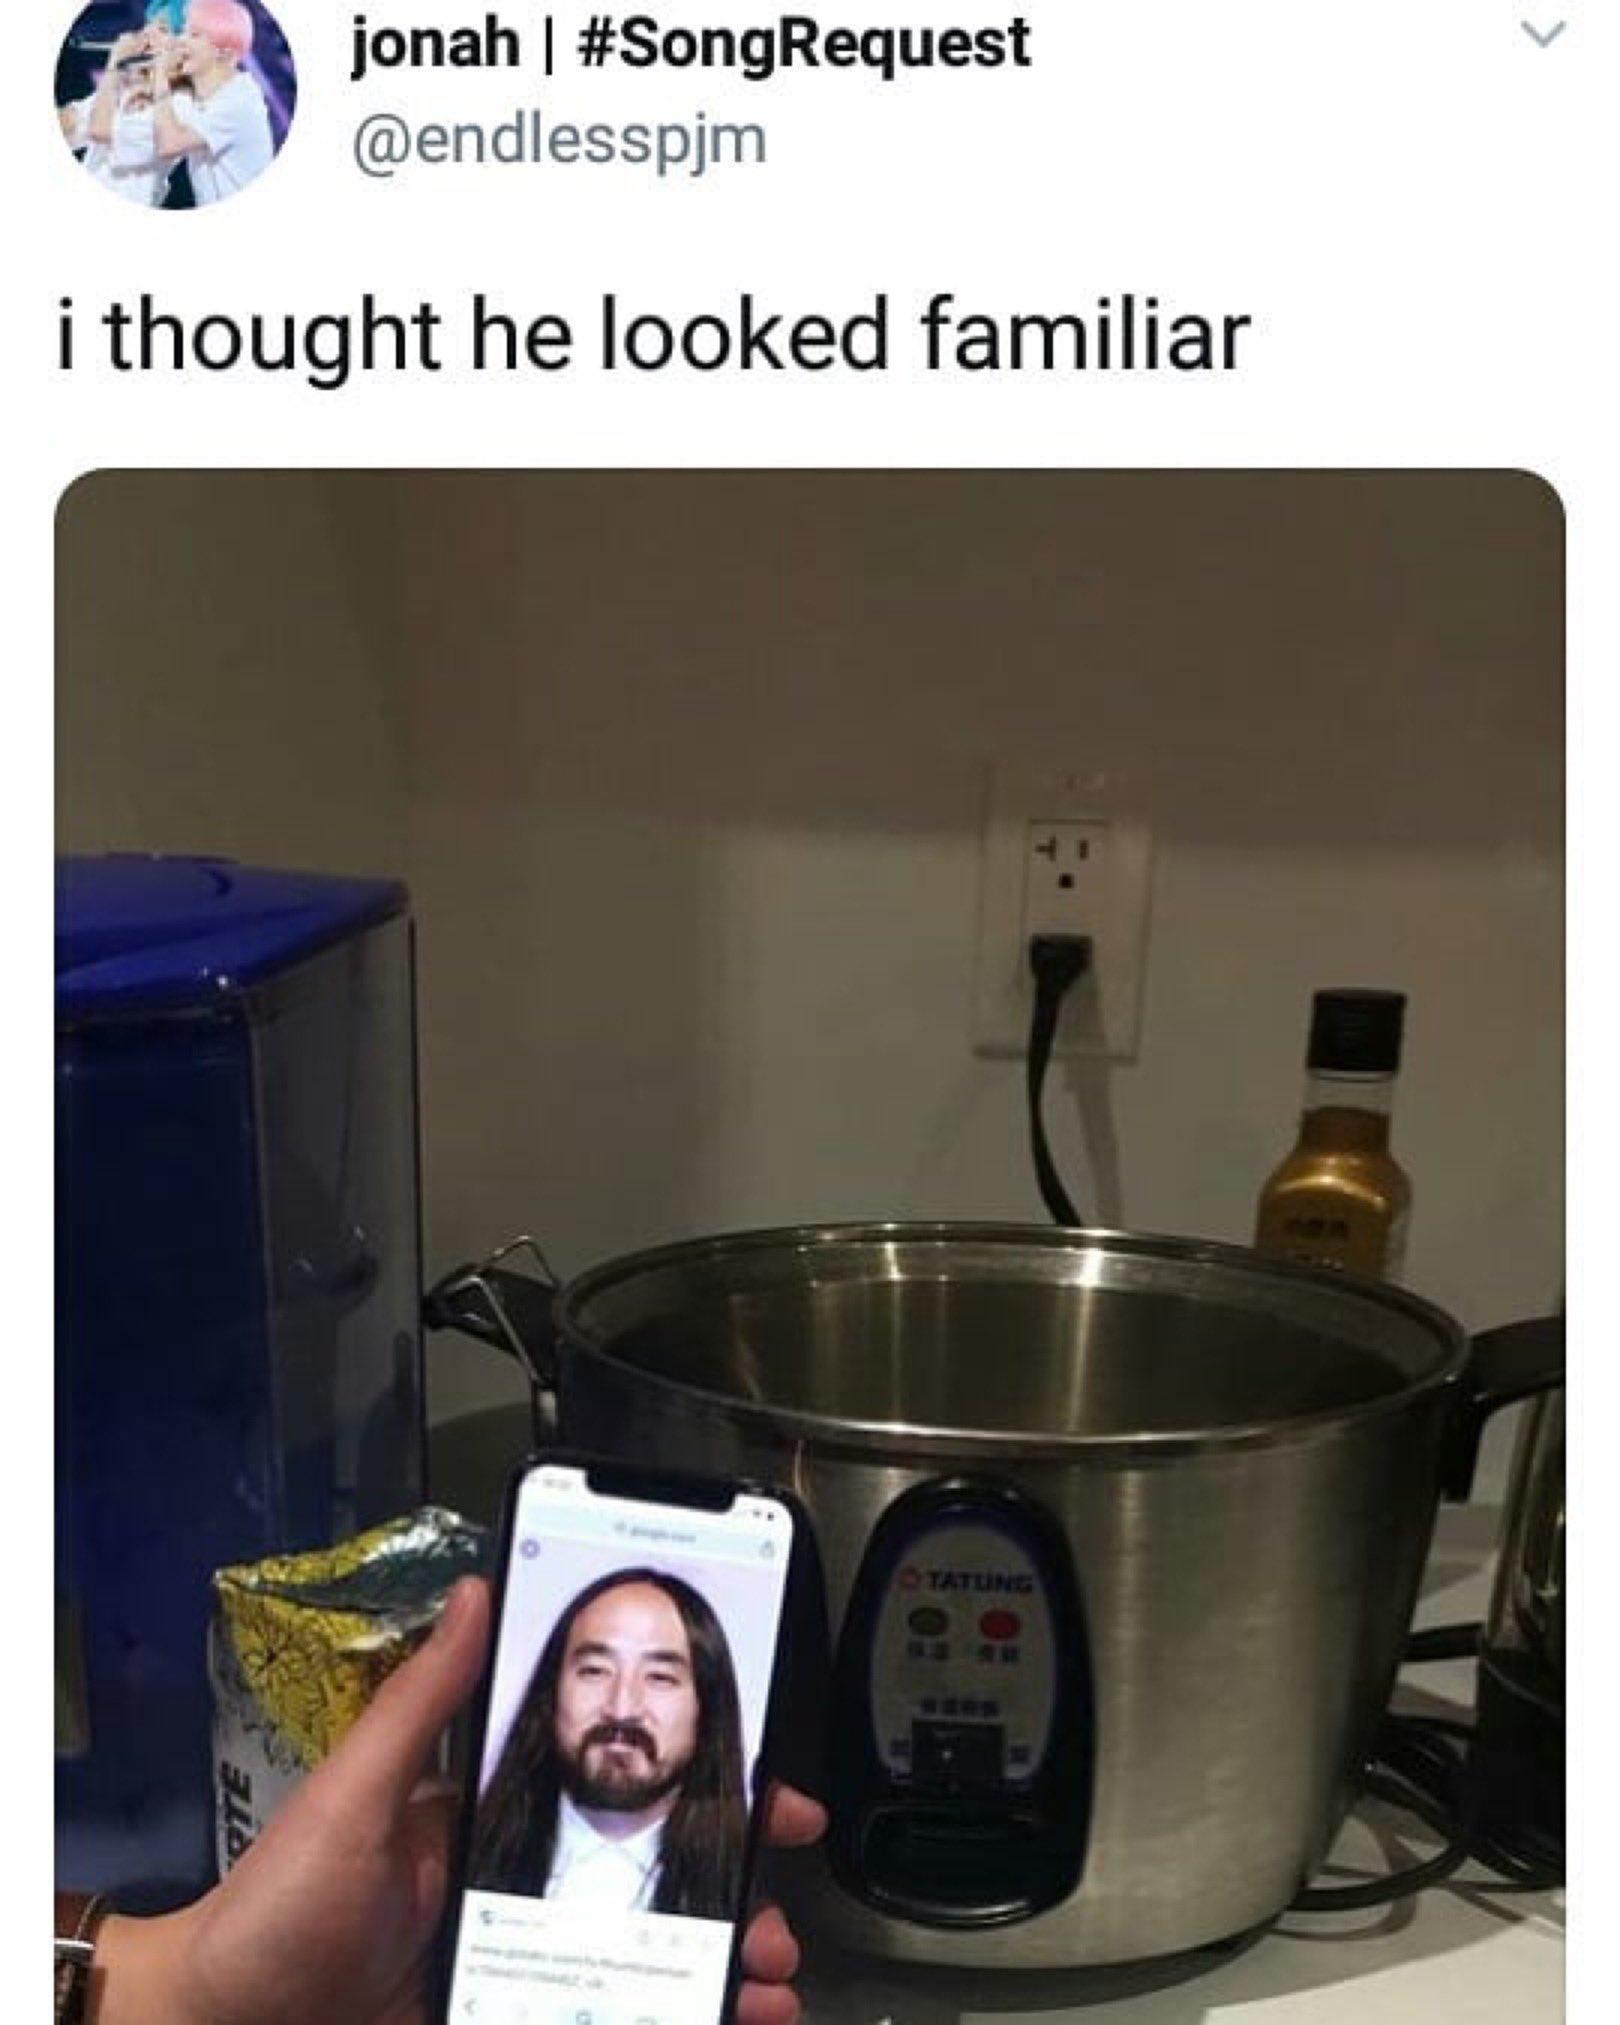 u made it when u look like a rice cooker https://t.co/yOztsDBqnG